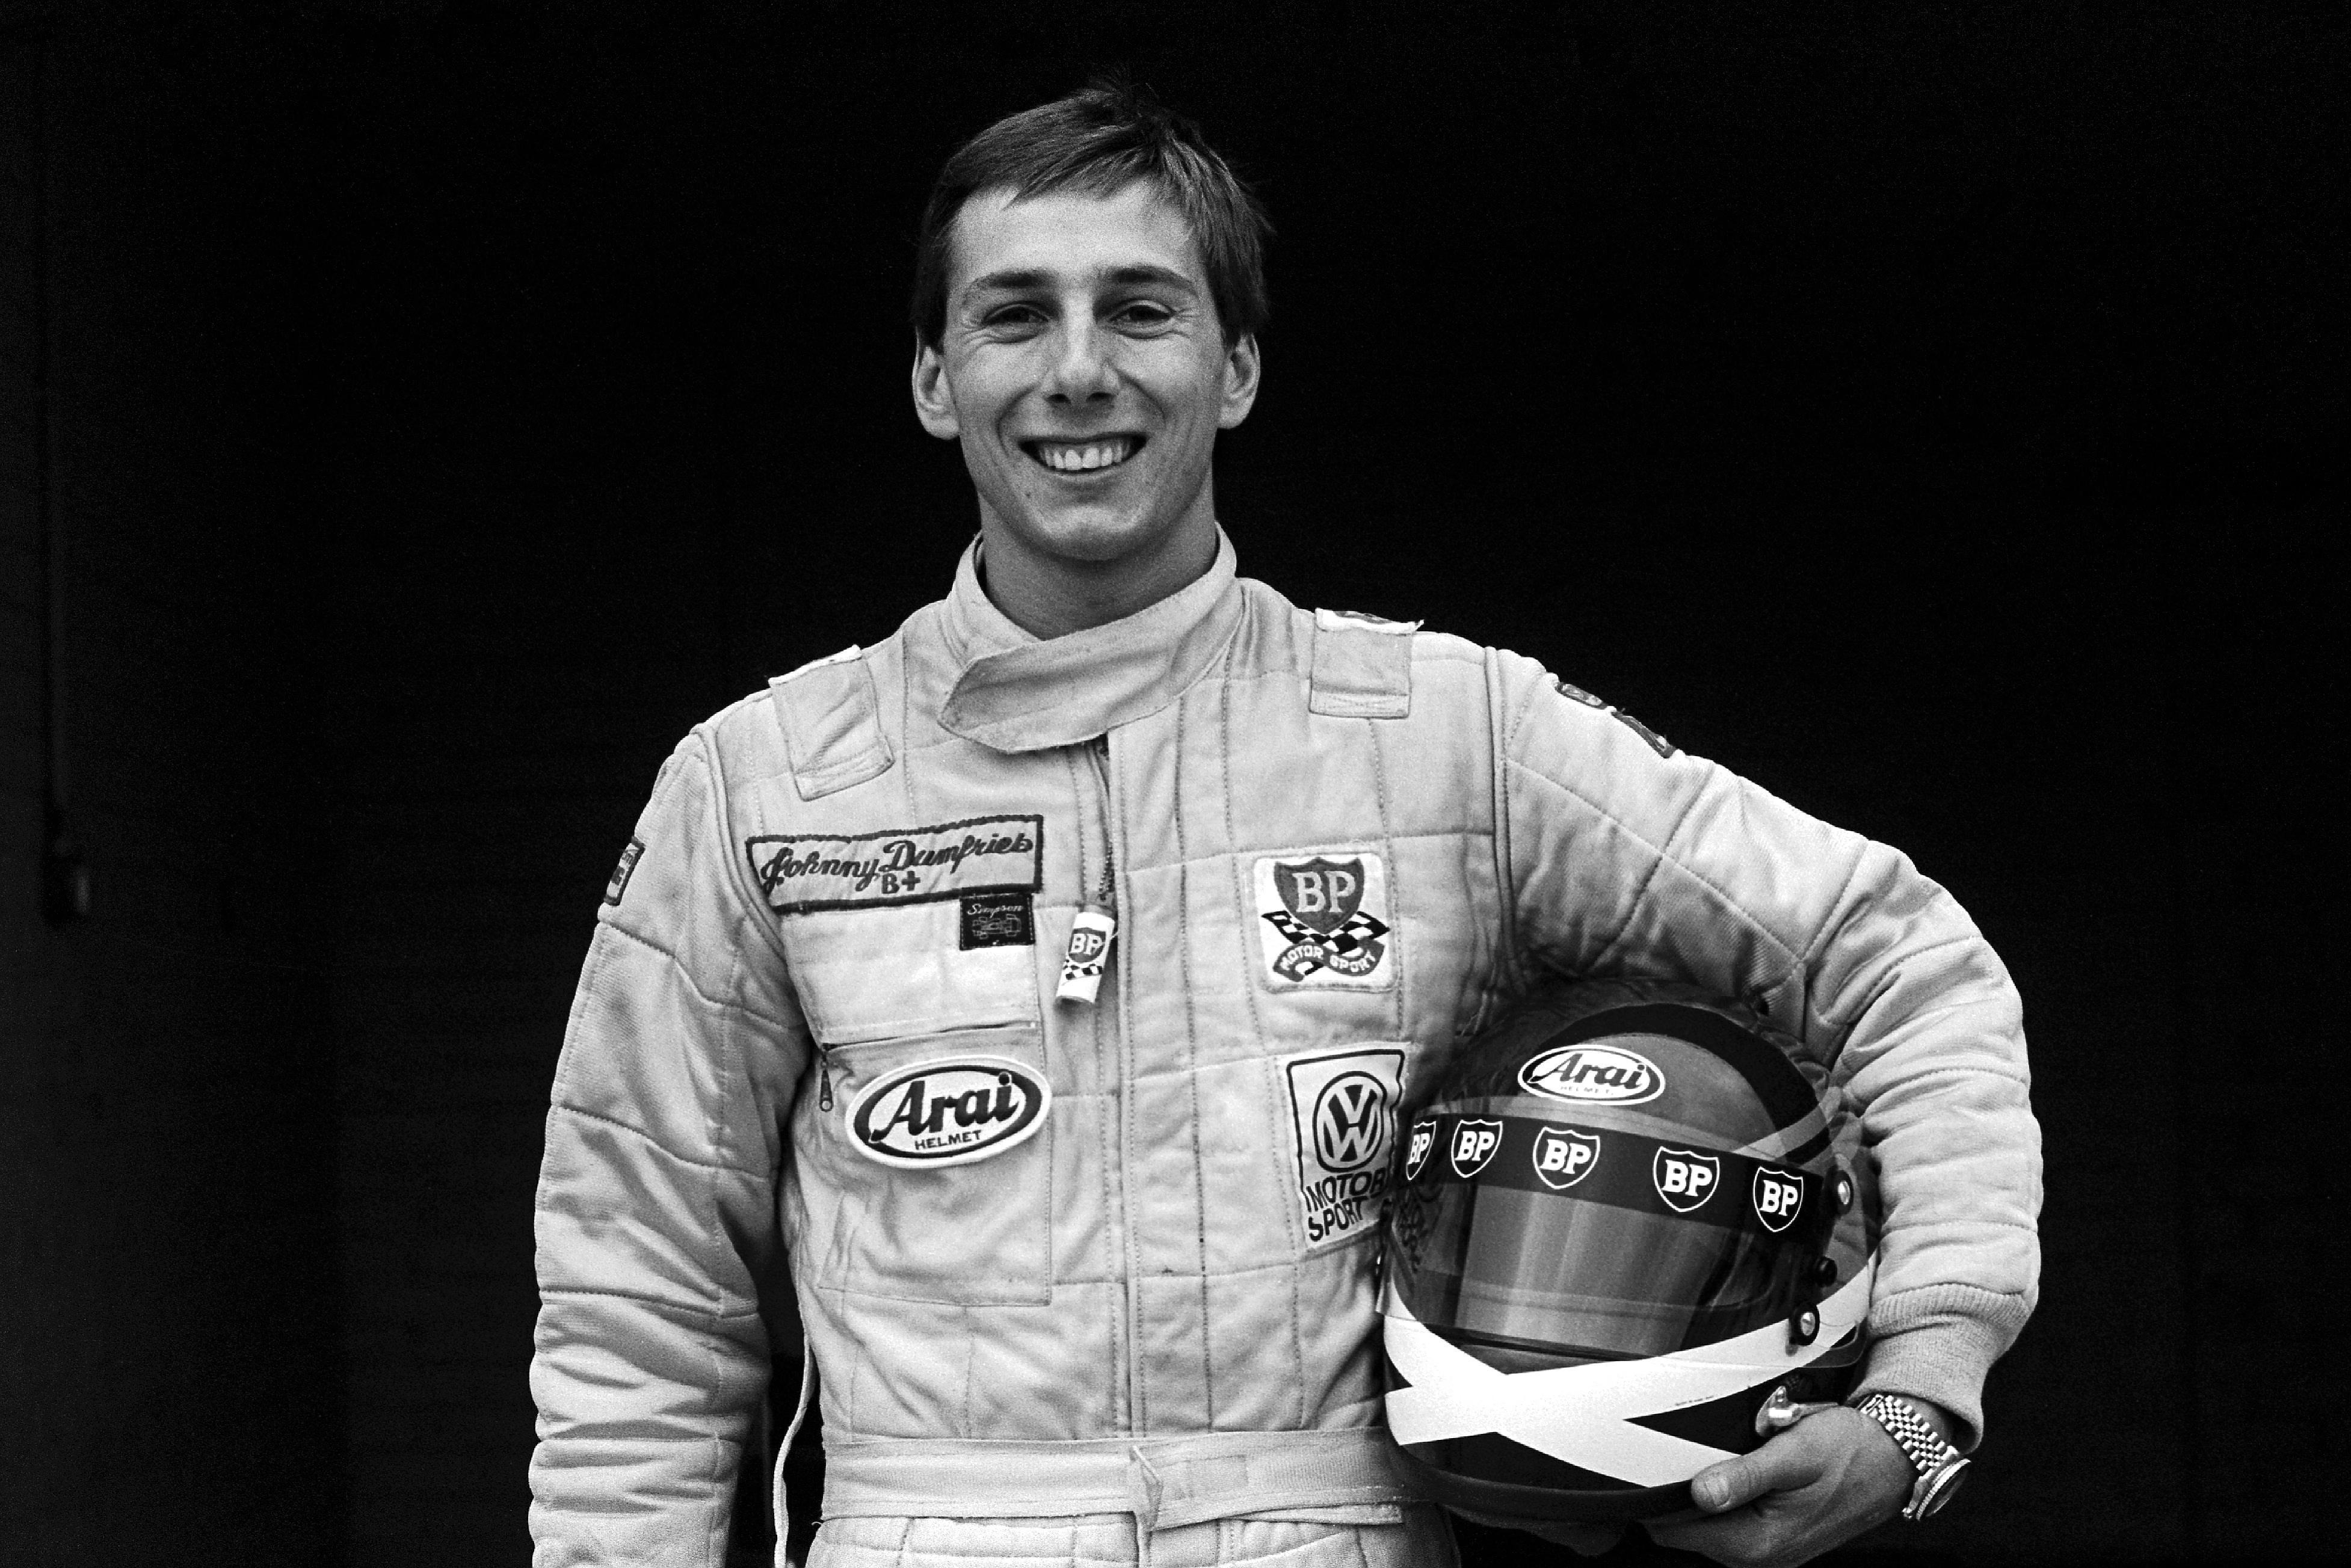 Johnny Dumfries, Ralt RT3/83-Toyota, European Formula 3, Donington Park, 1983